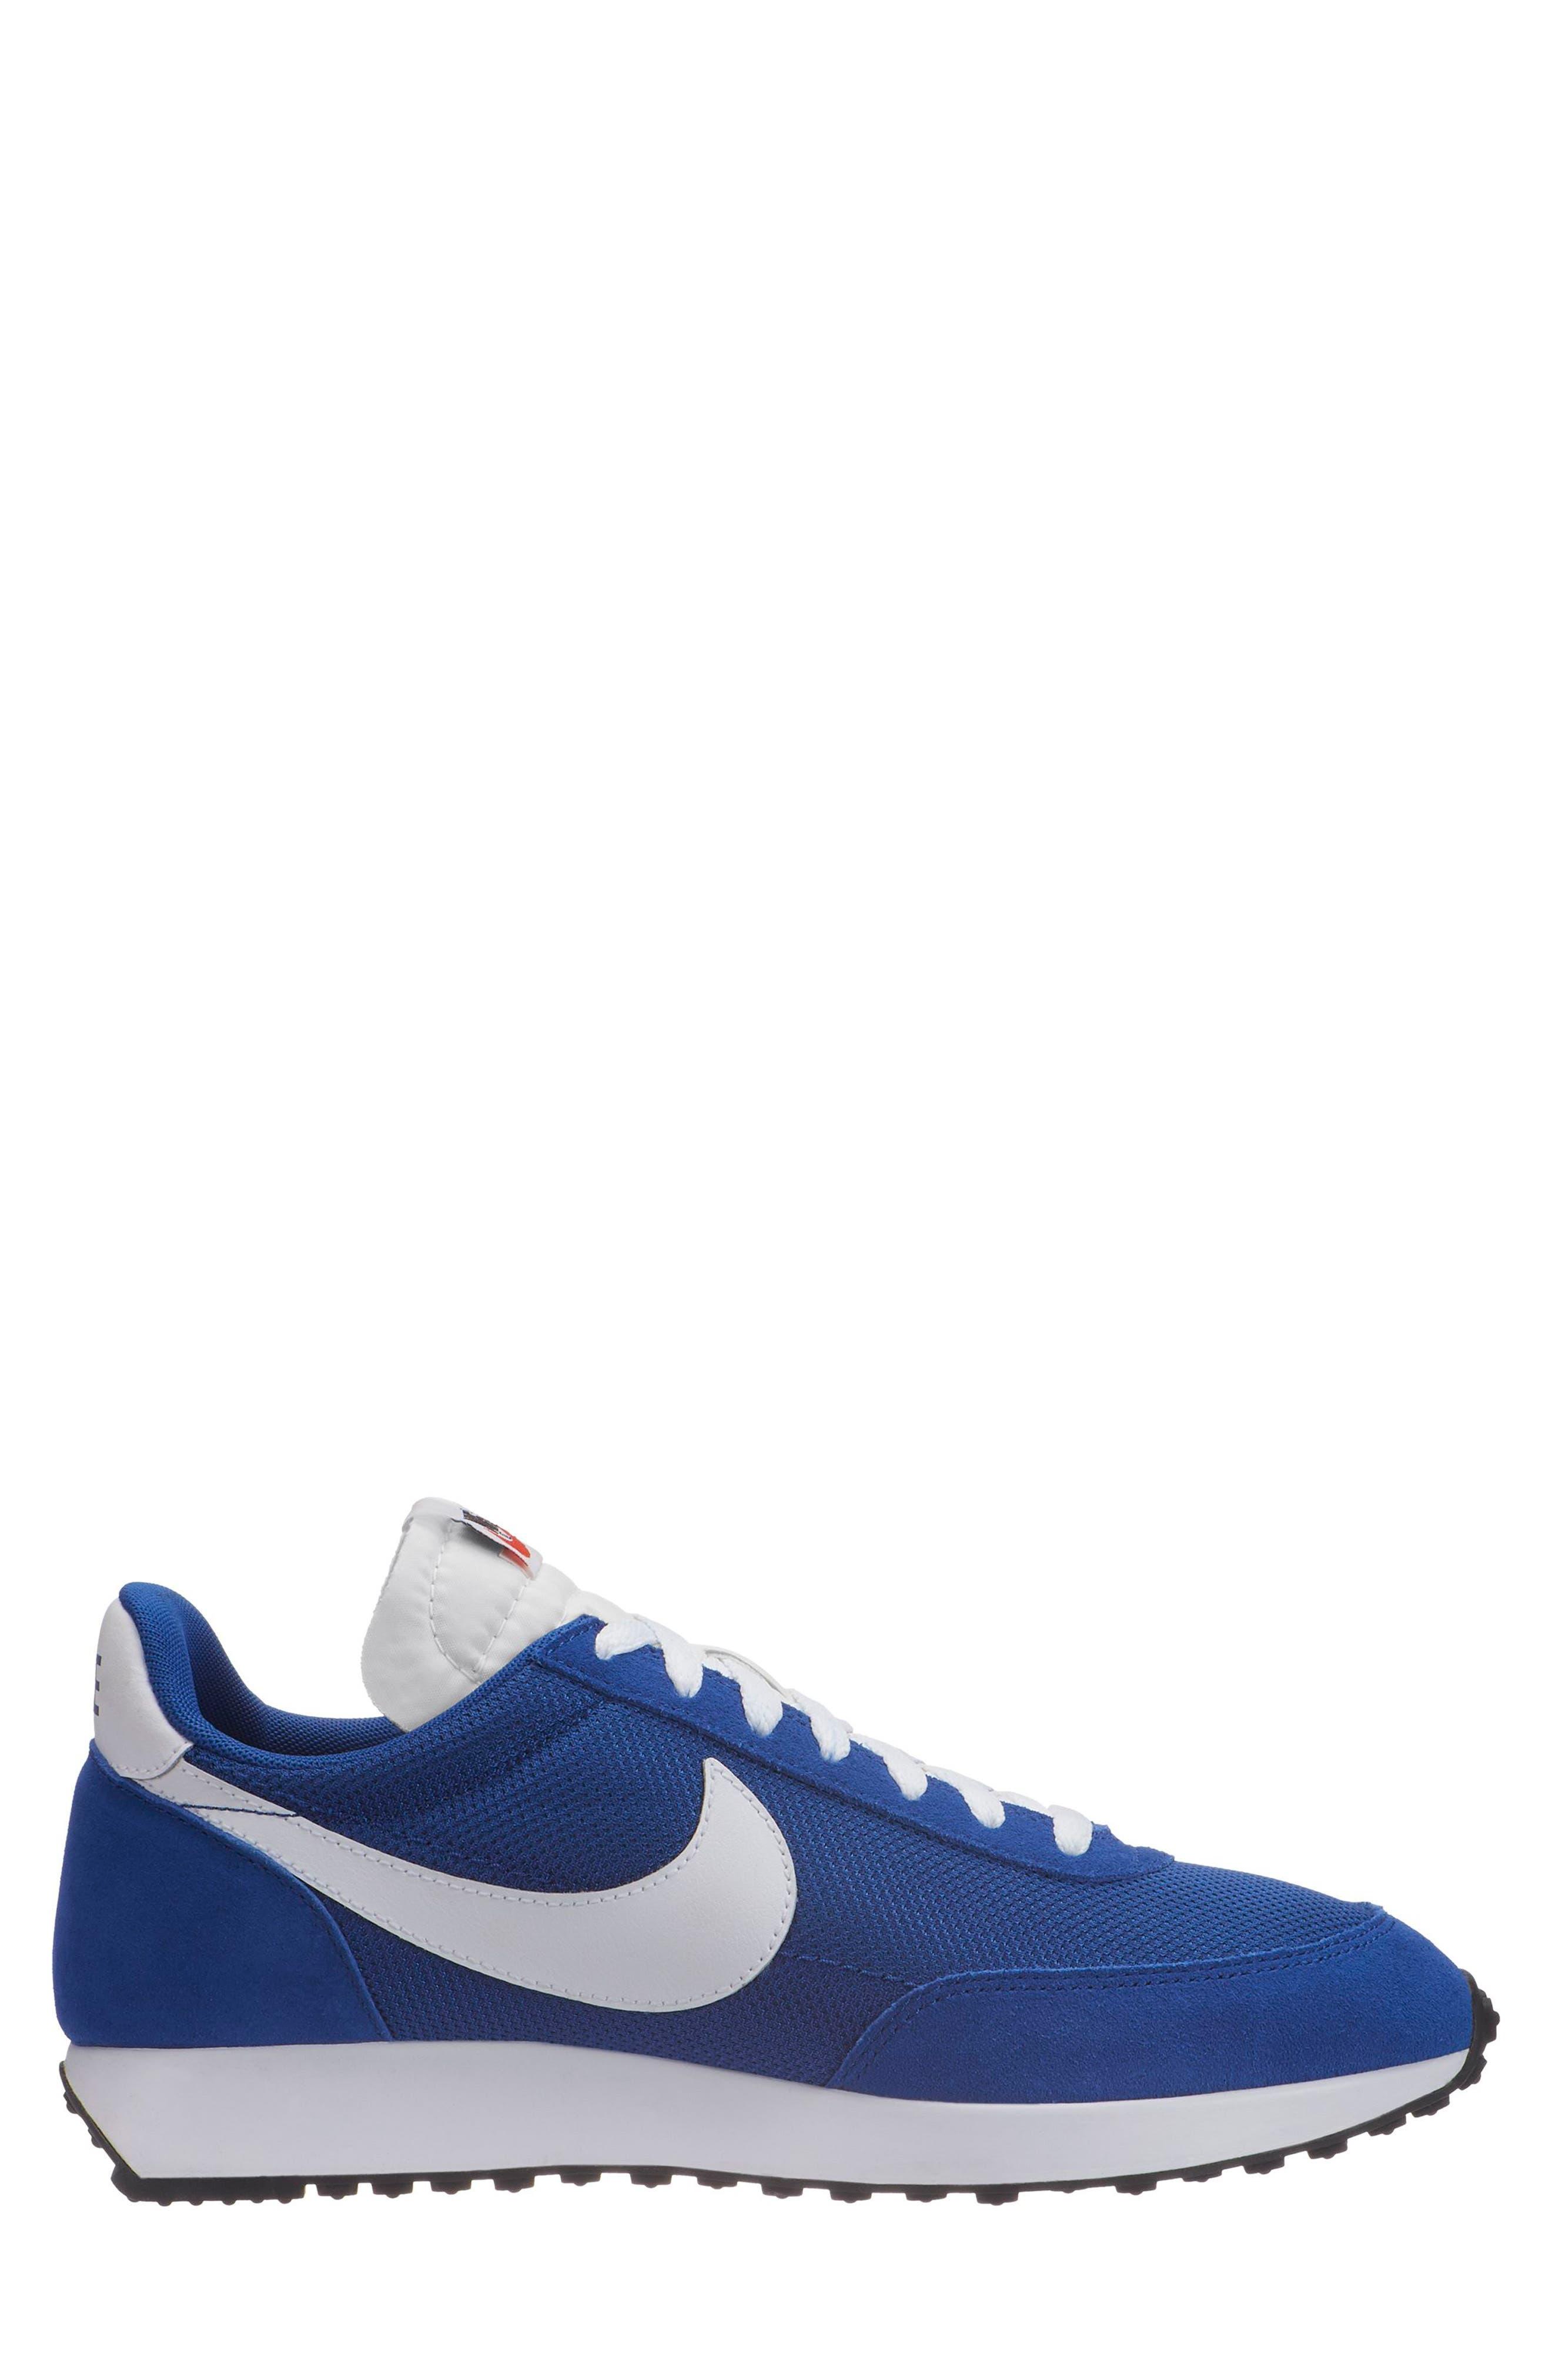 NIKE, Air Tailwind '79 Sneaker, Main thumbnail 1, color, 405